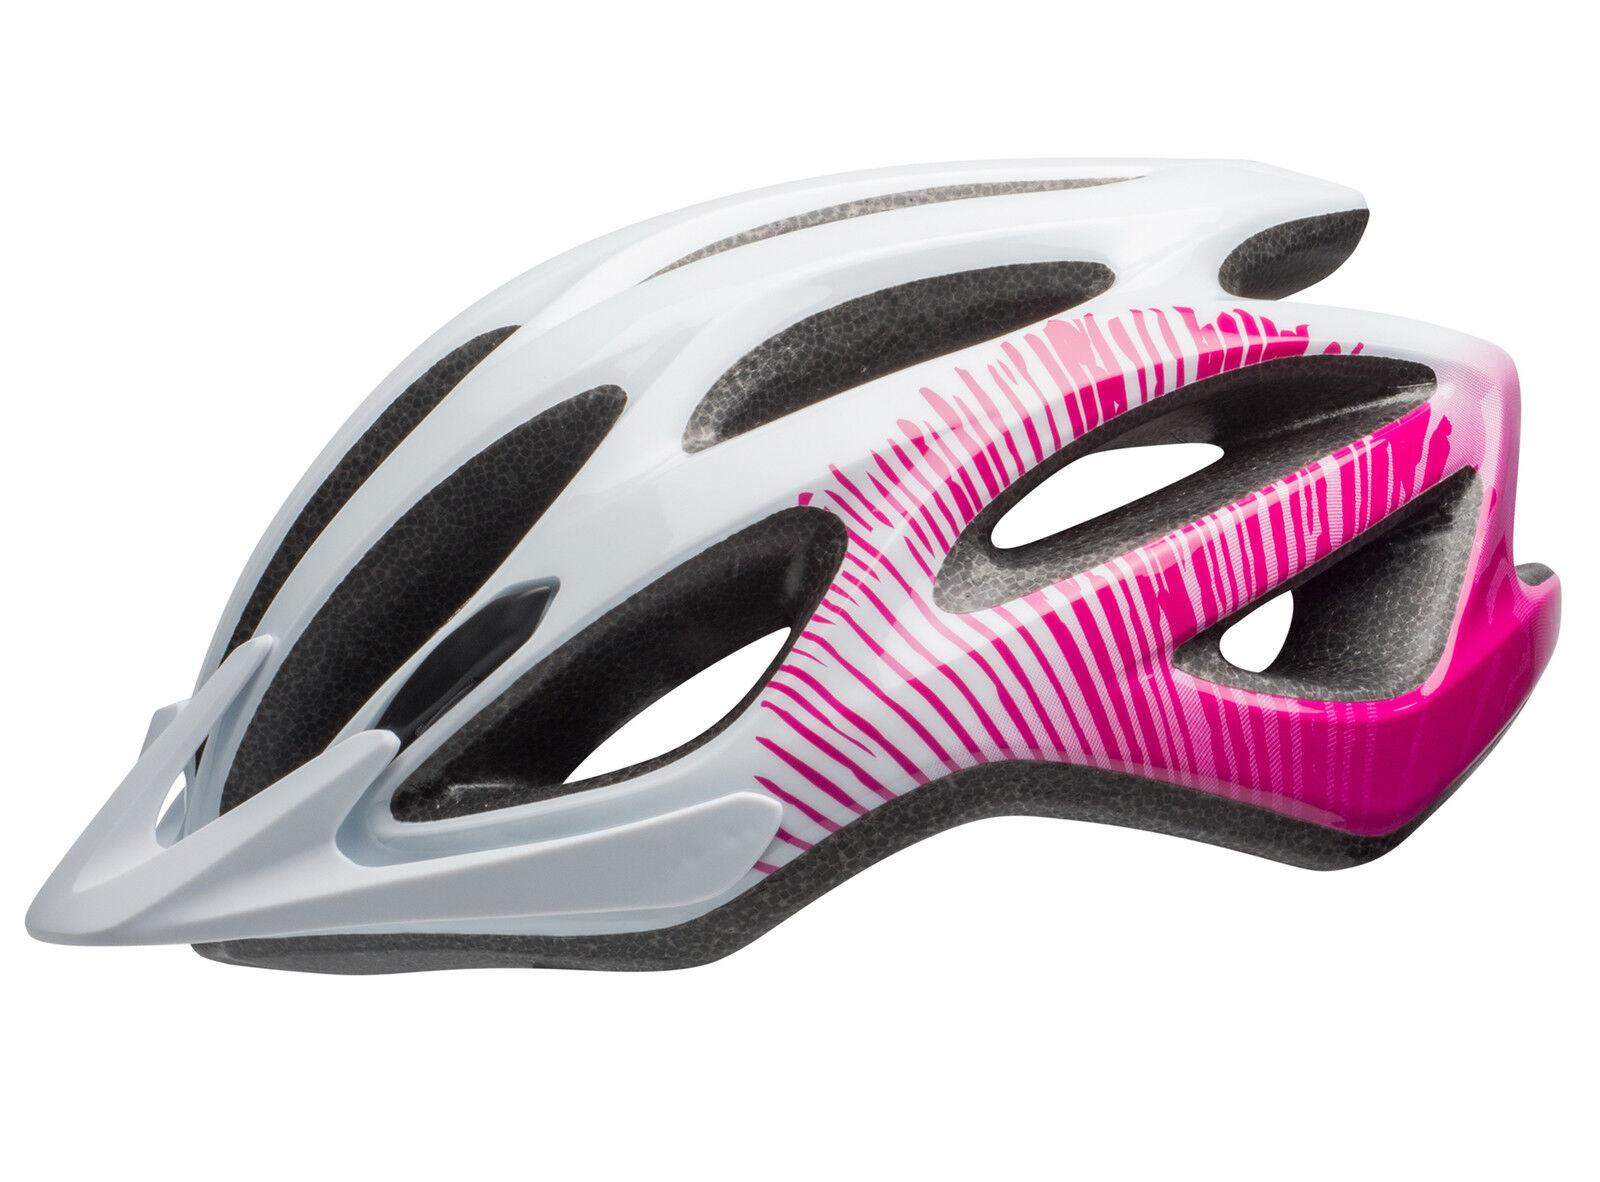 Bell Coast Joy Ride señora bicicleta casco talla 50-57cm blanco blanco blanco rosa 2018 7db958